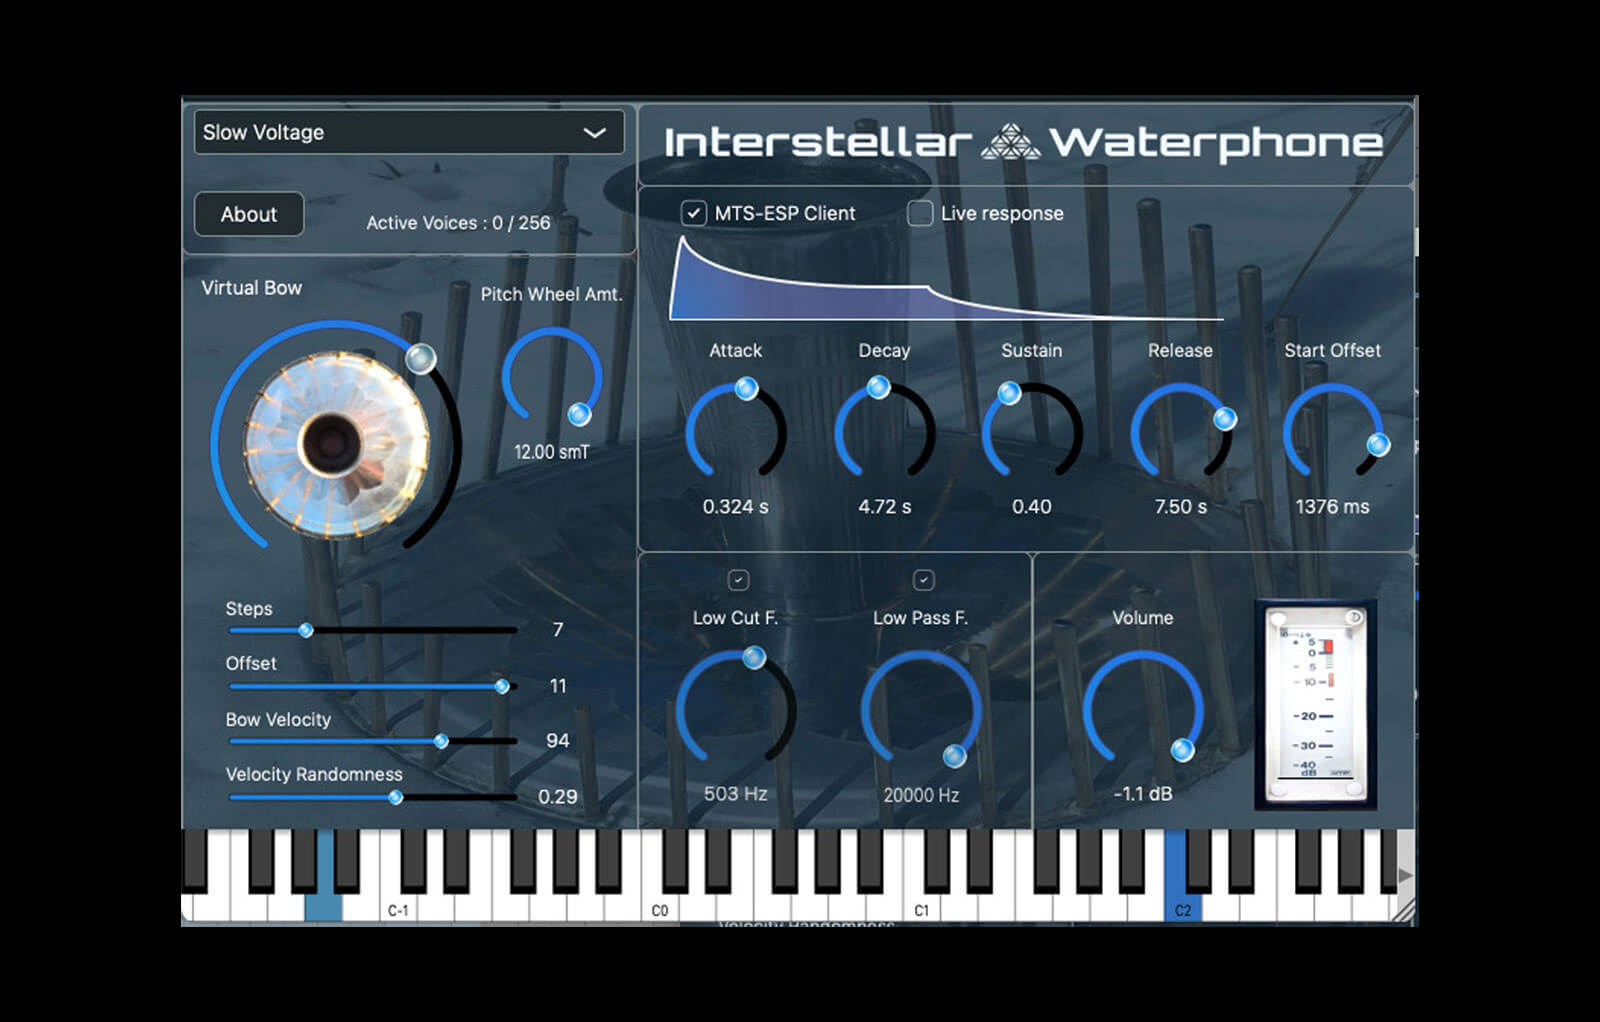 Interstellar Waterphone